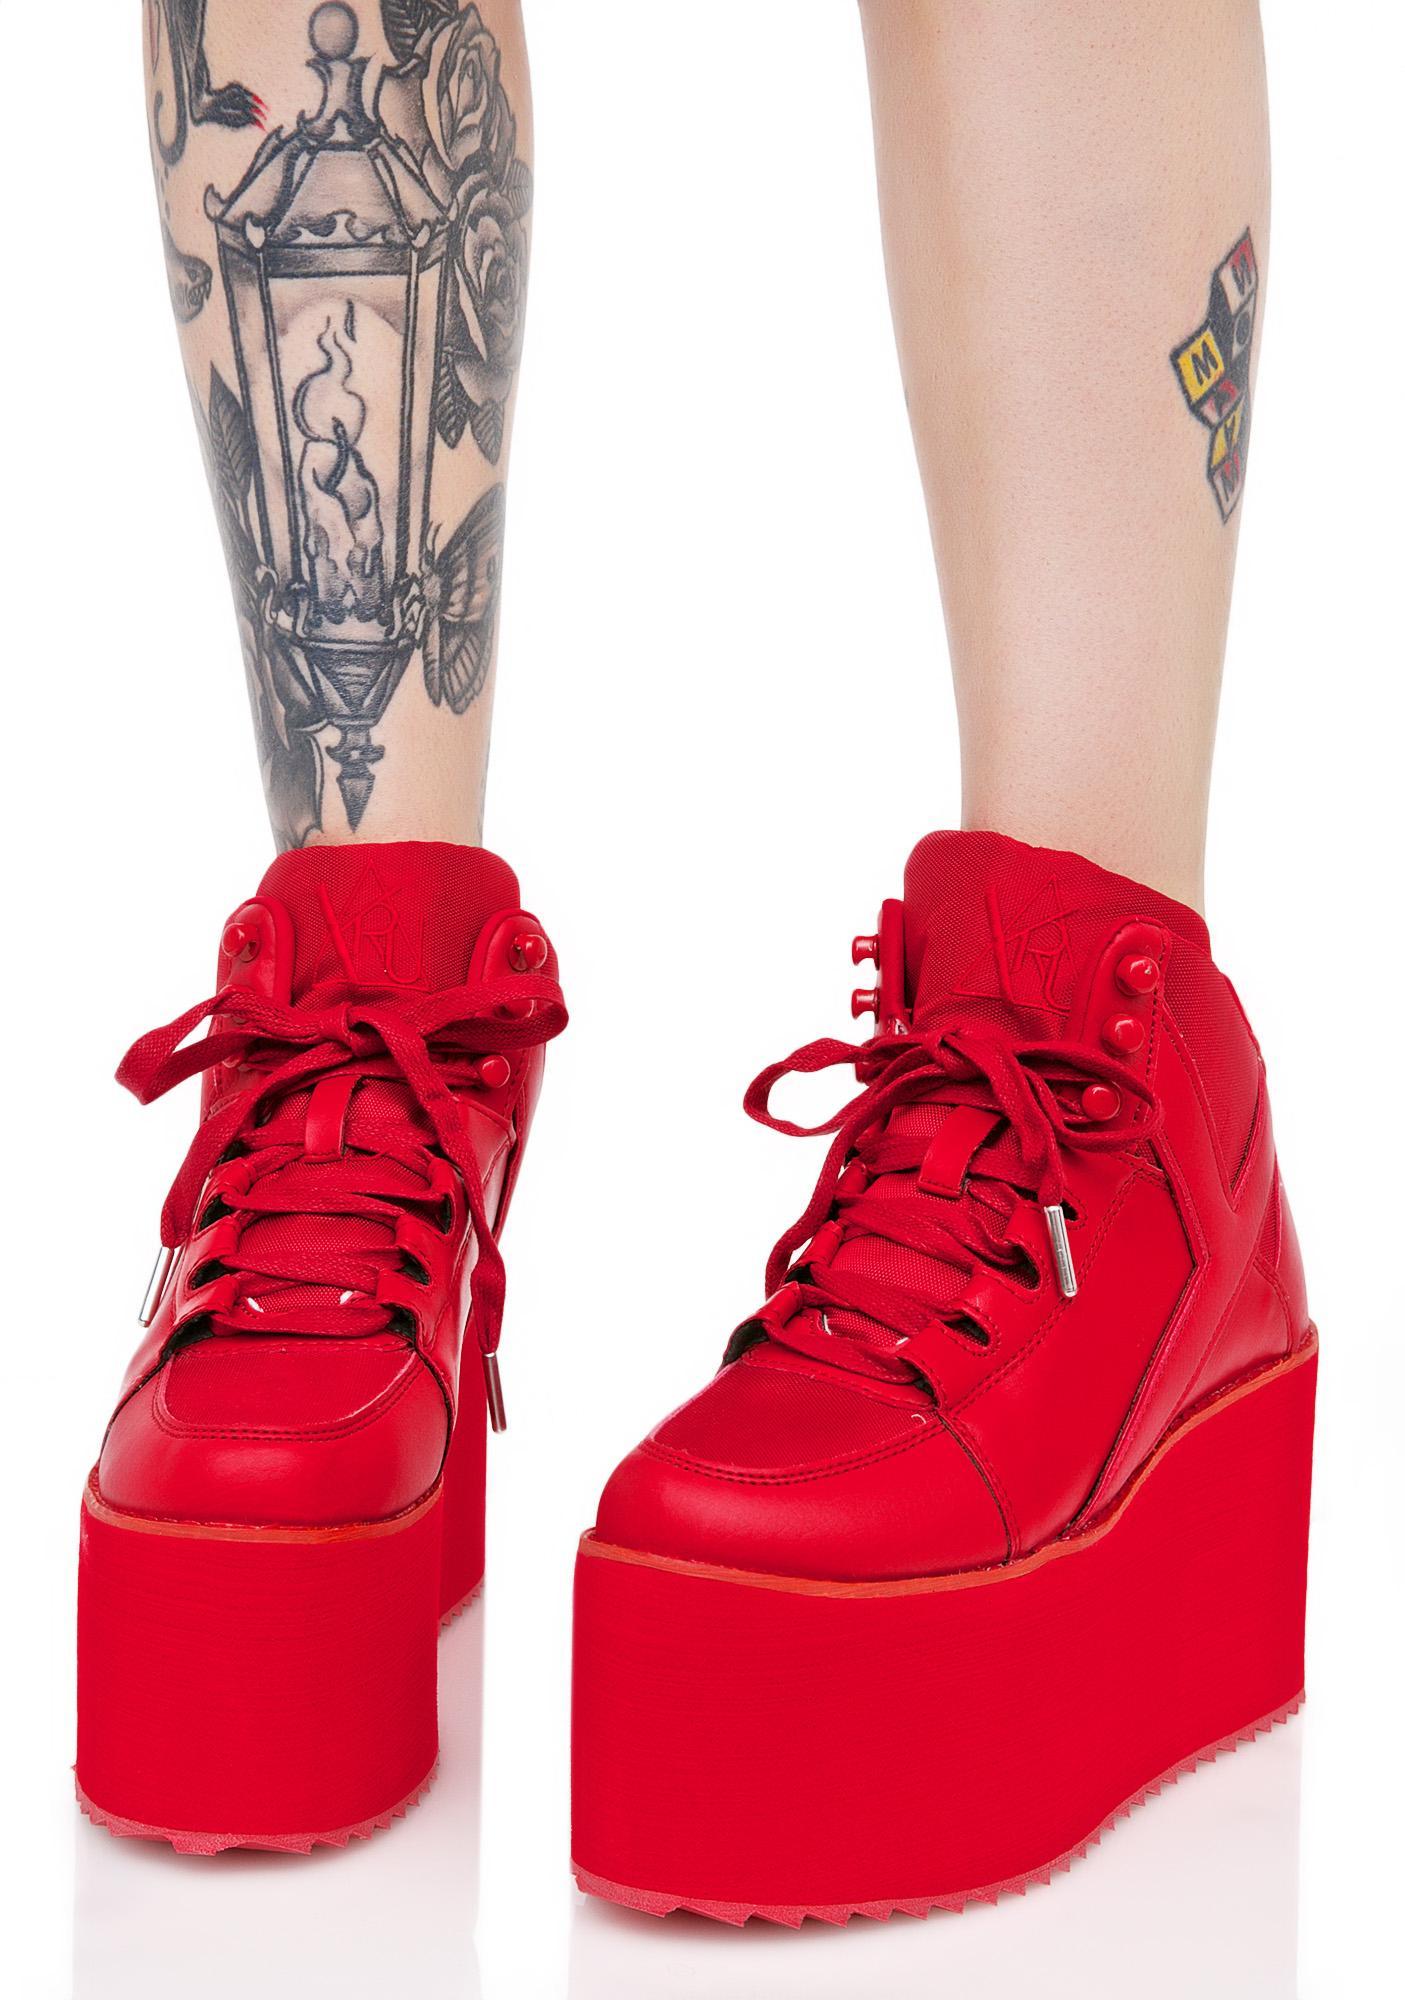 Y.R.U. Redd Hot Qozmo Platform Sneakers